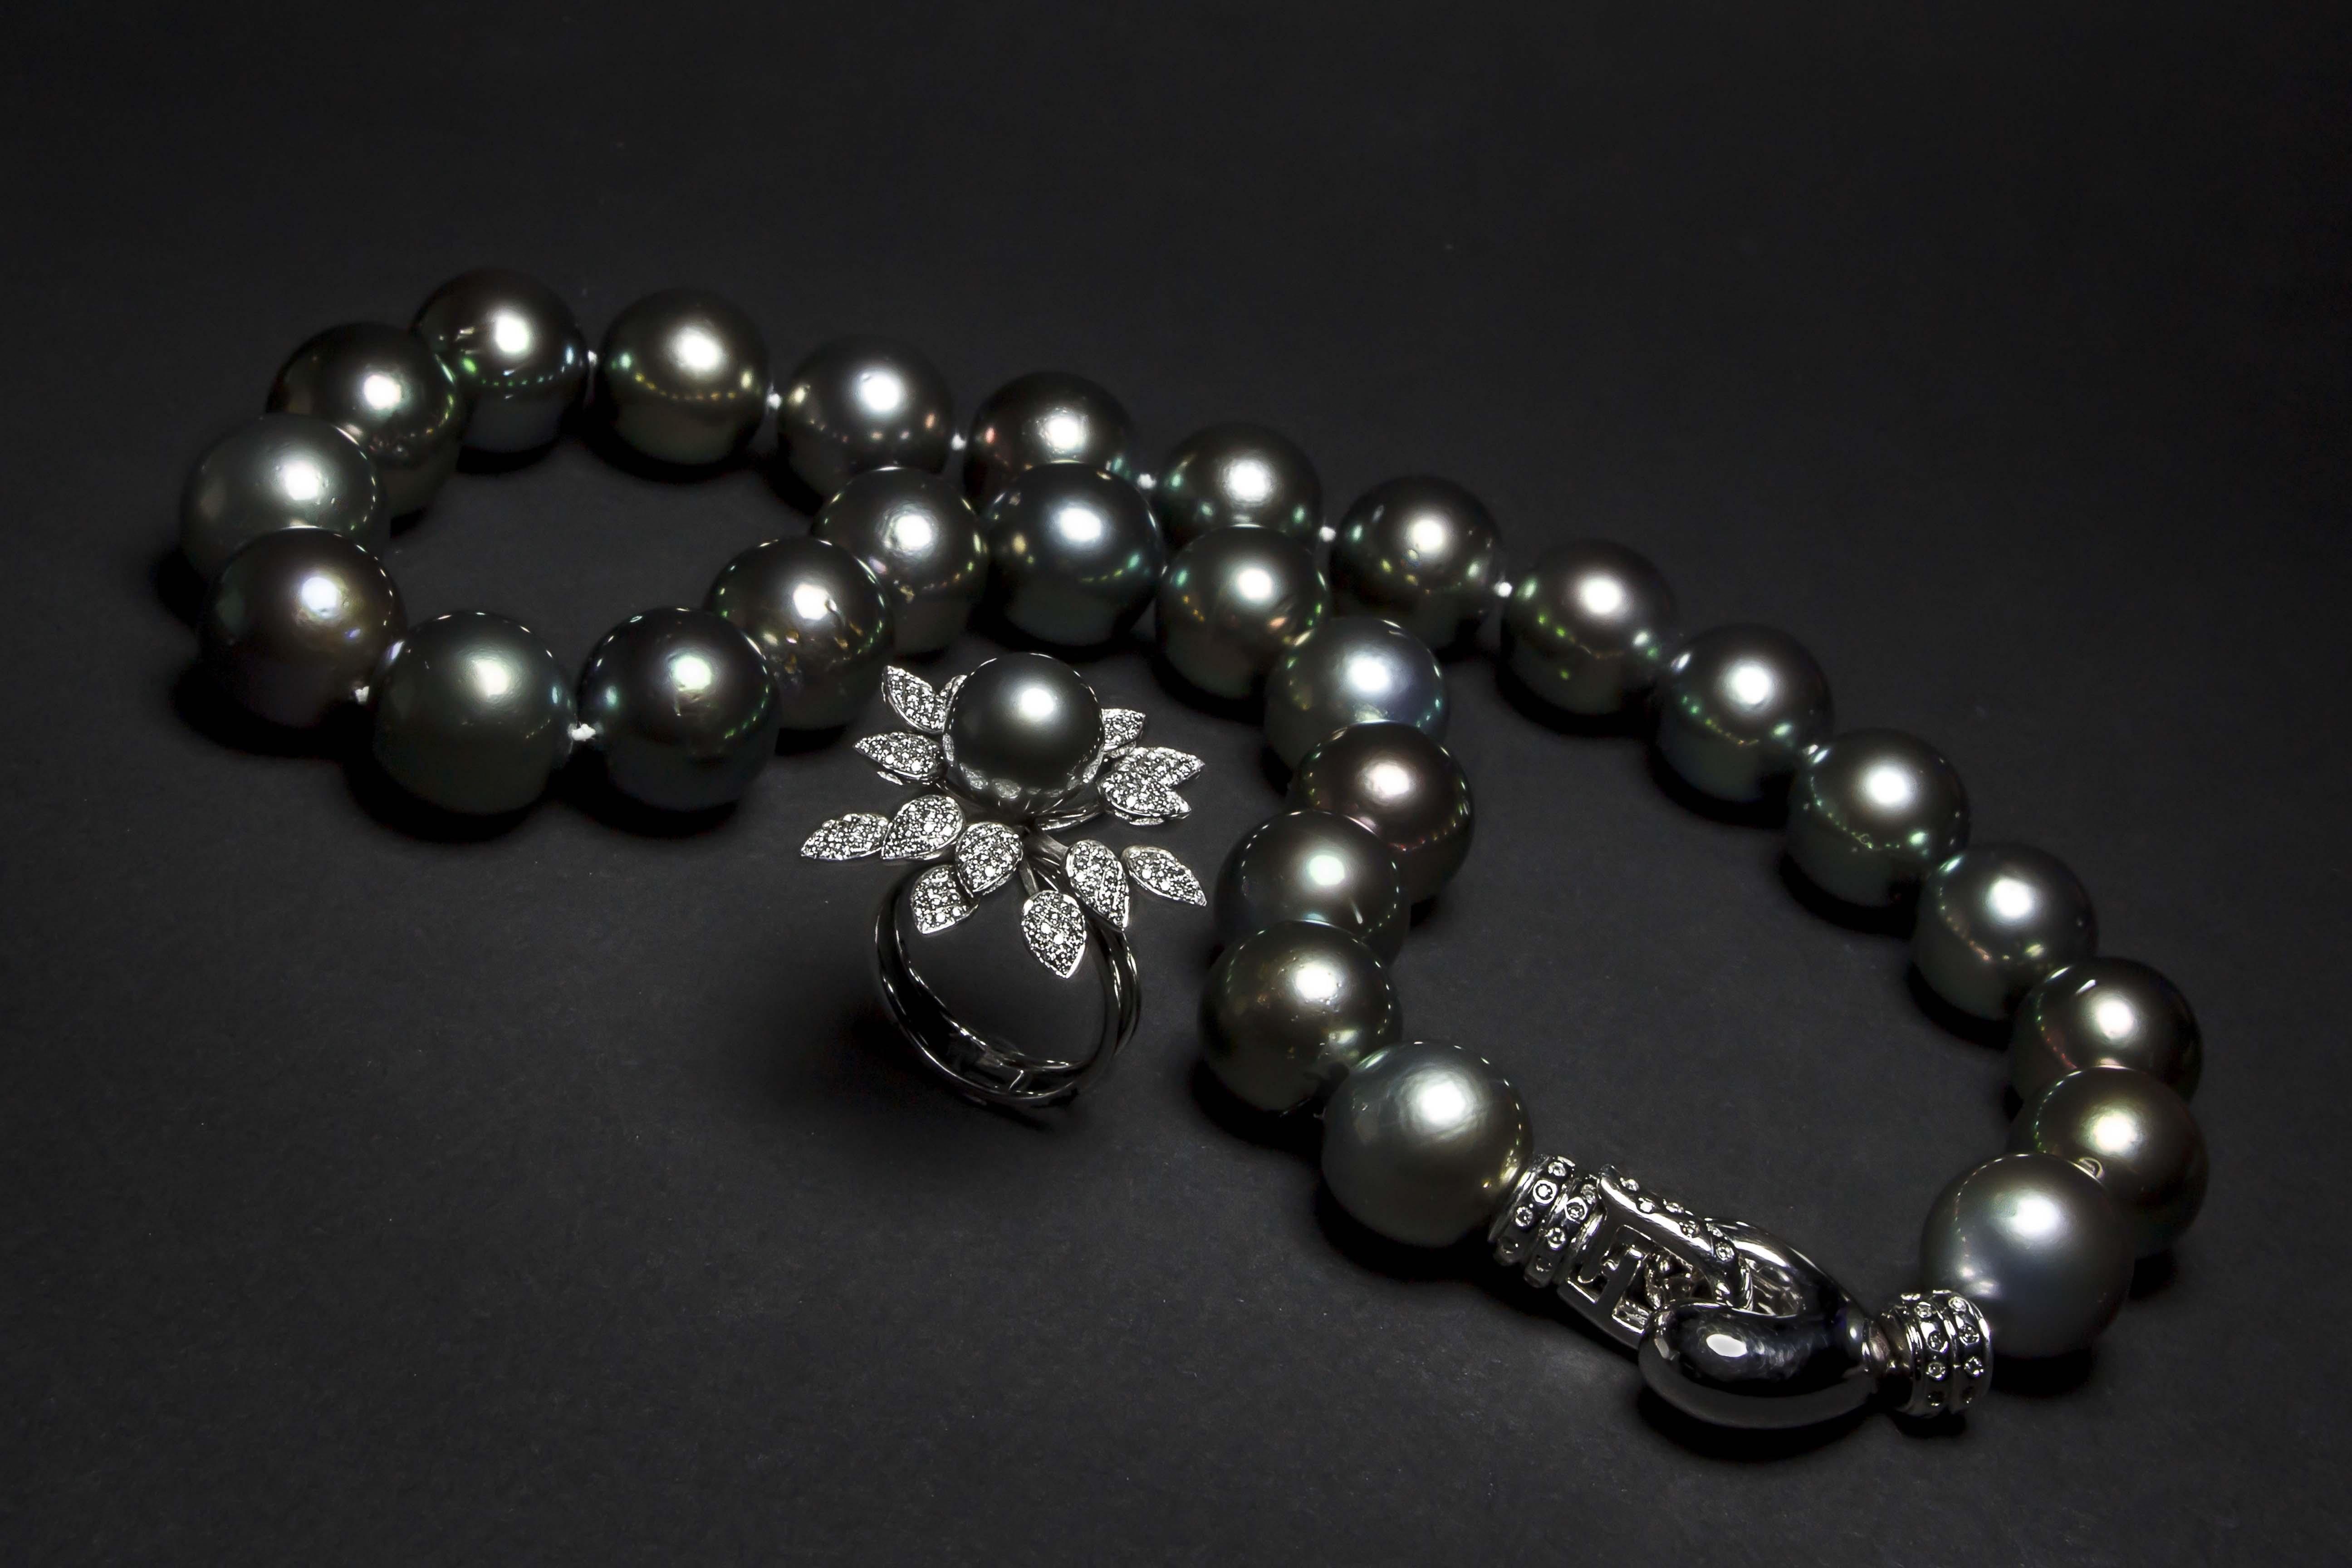 1a736a0aaa79 Collar perlas de Tahiti - Jose Luis Joyero